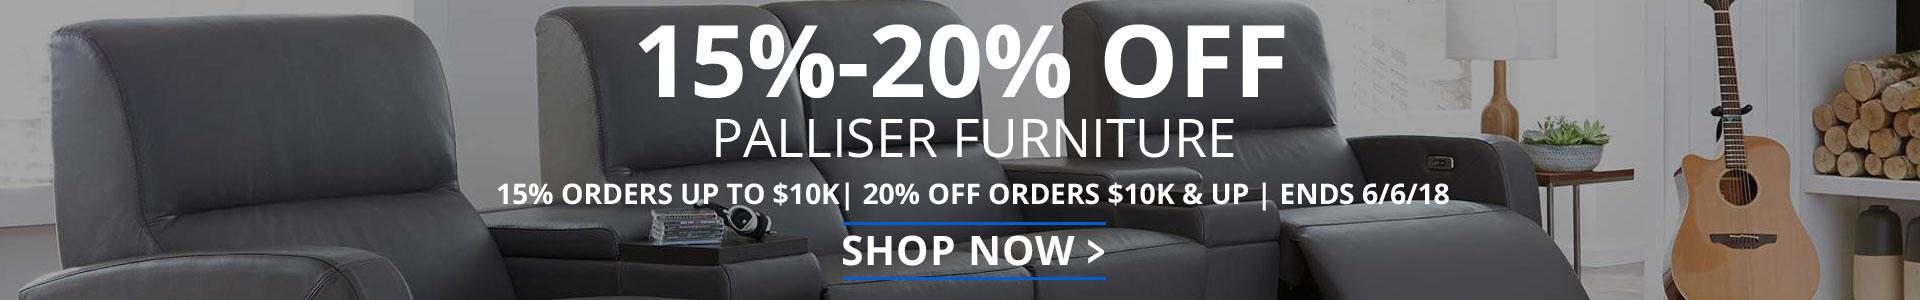 Seatup.com Palliser Sale